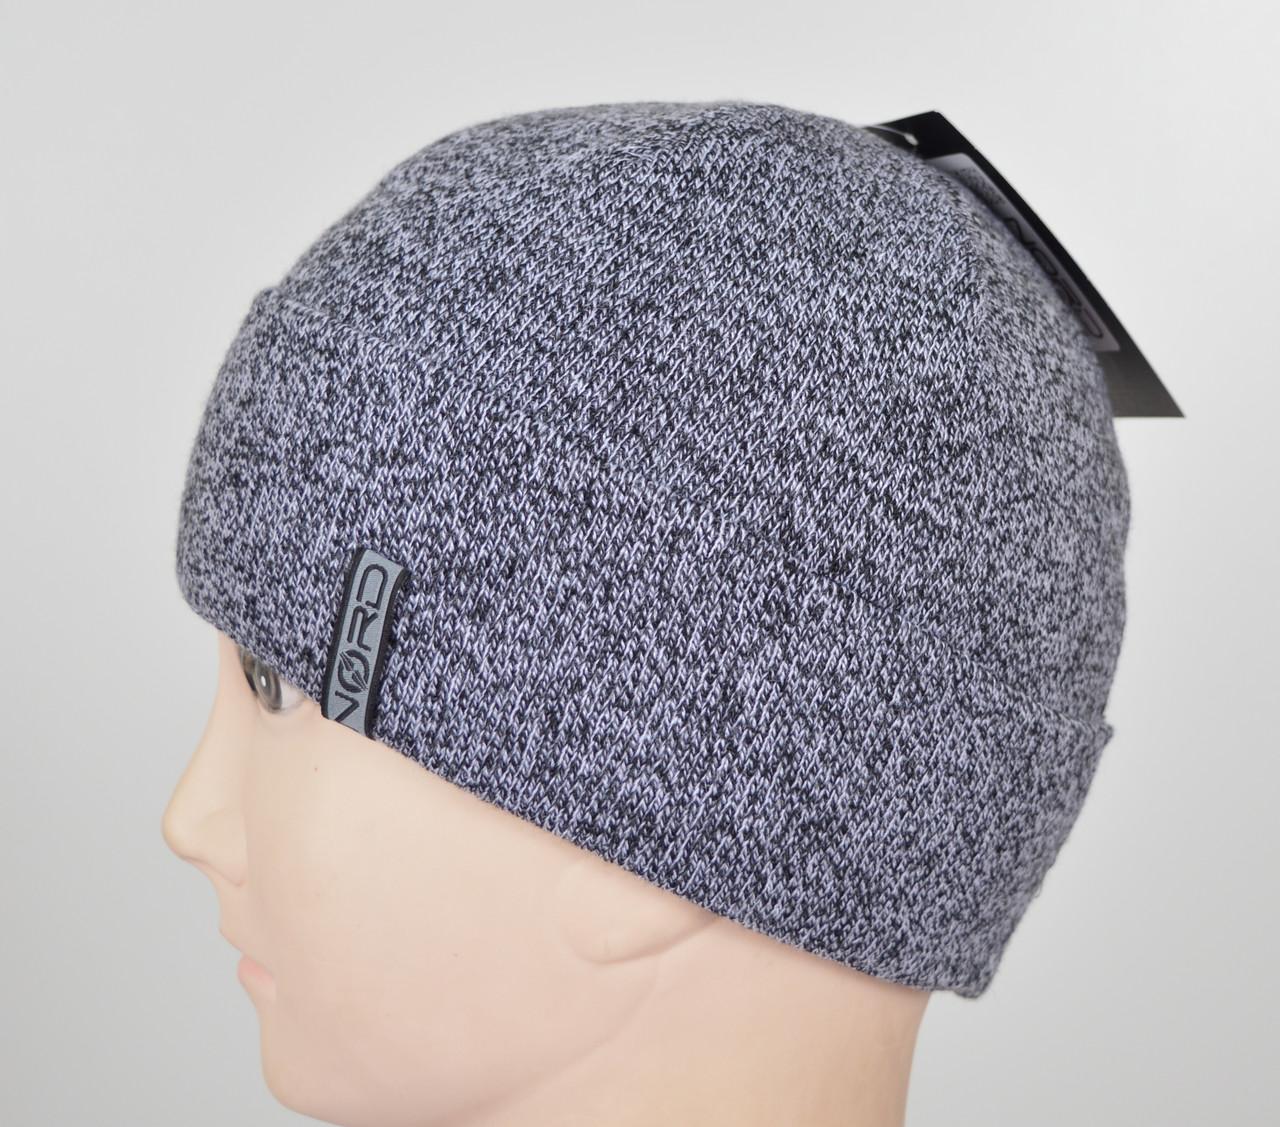 Мужская шапка Nord S-1802 березка